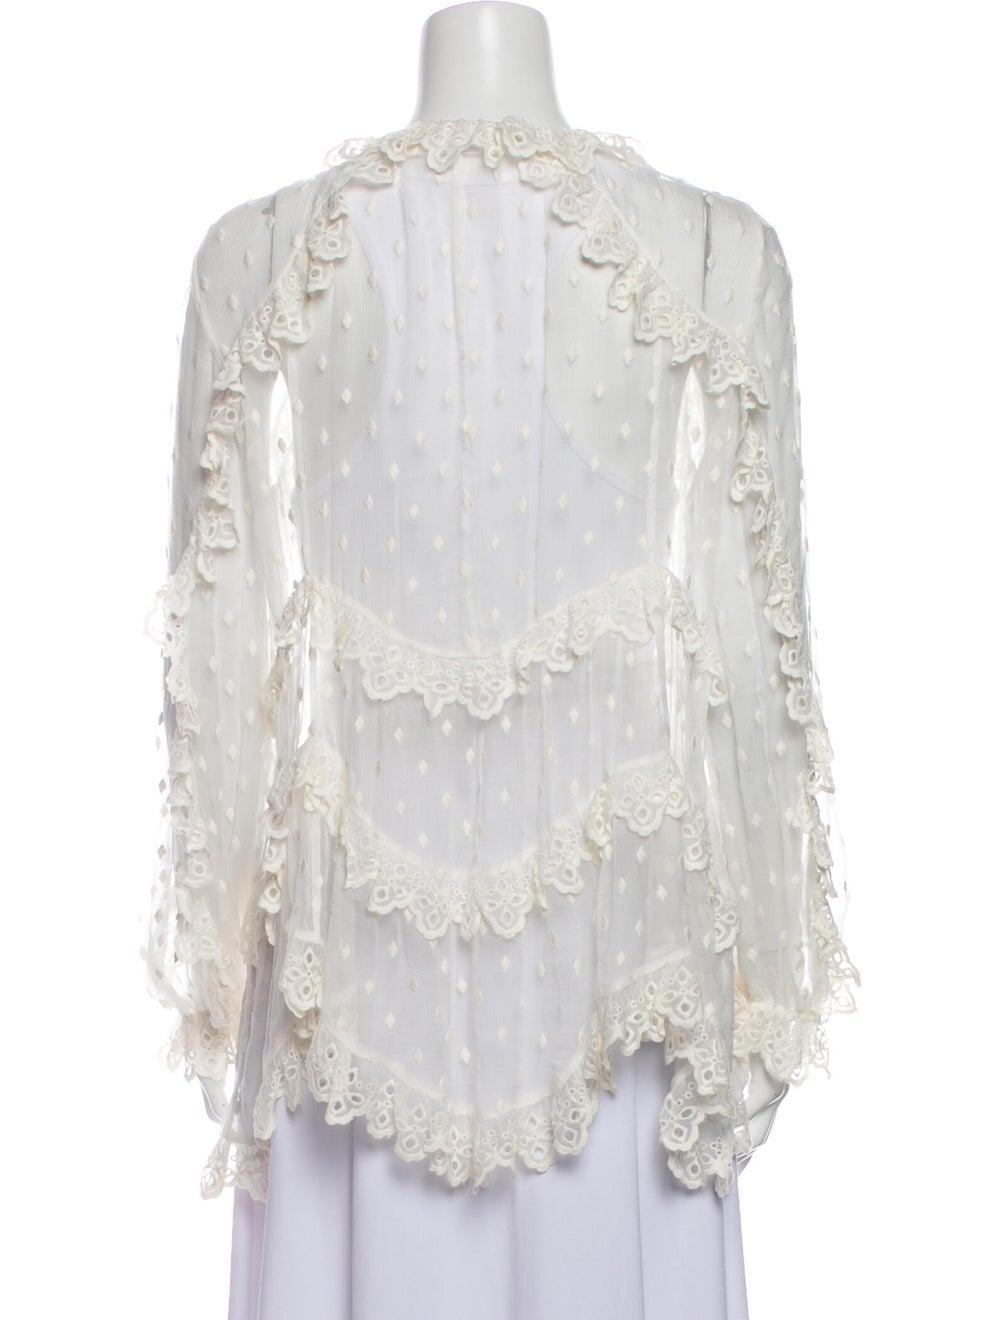 Zimmermann Silk Lace Pattern Blouse White - image 3